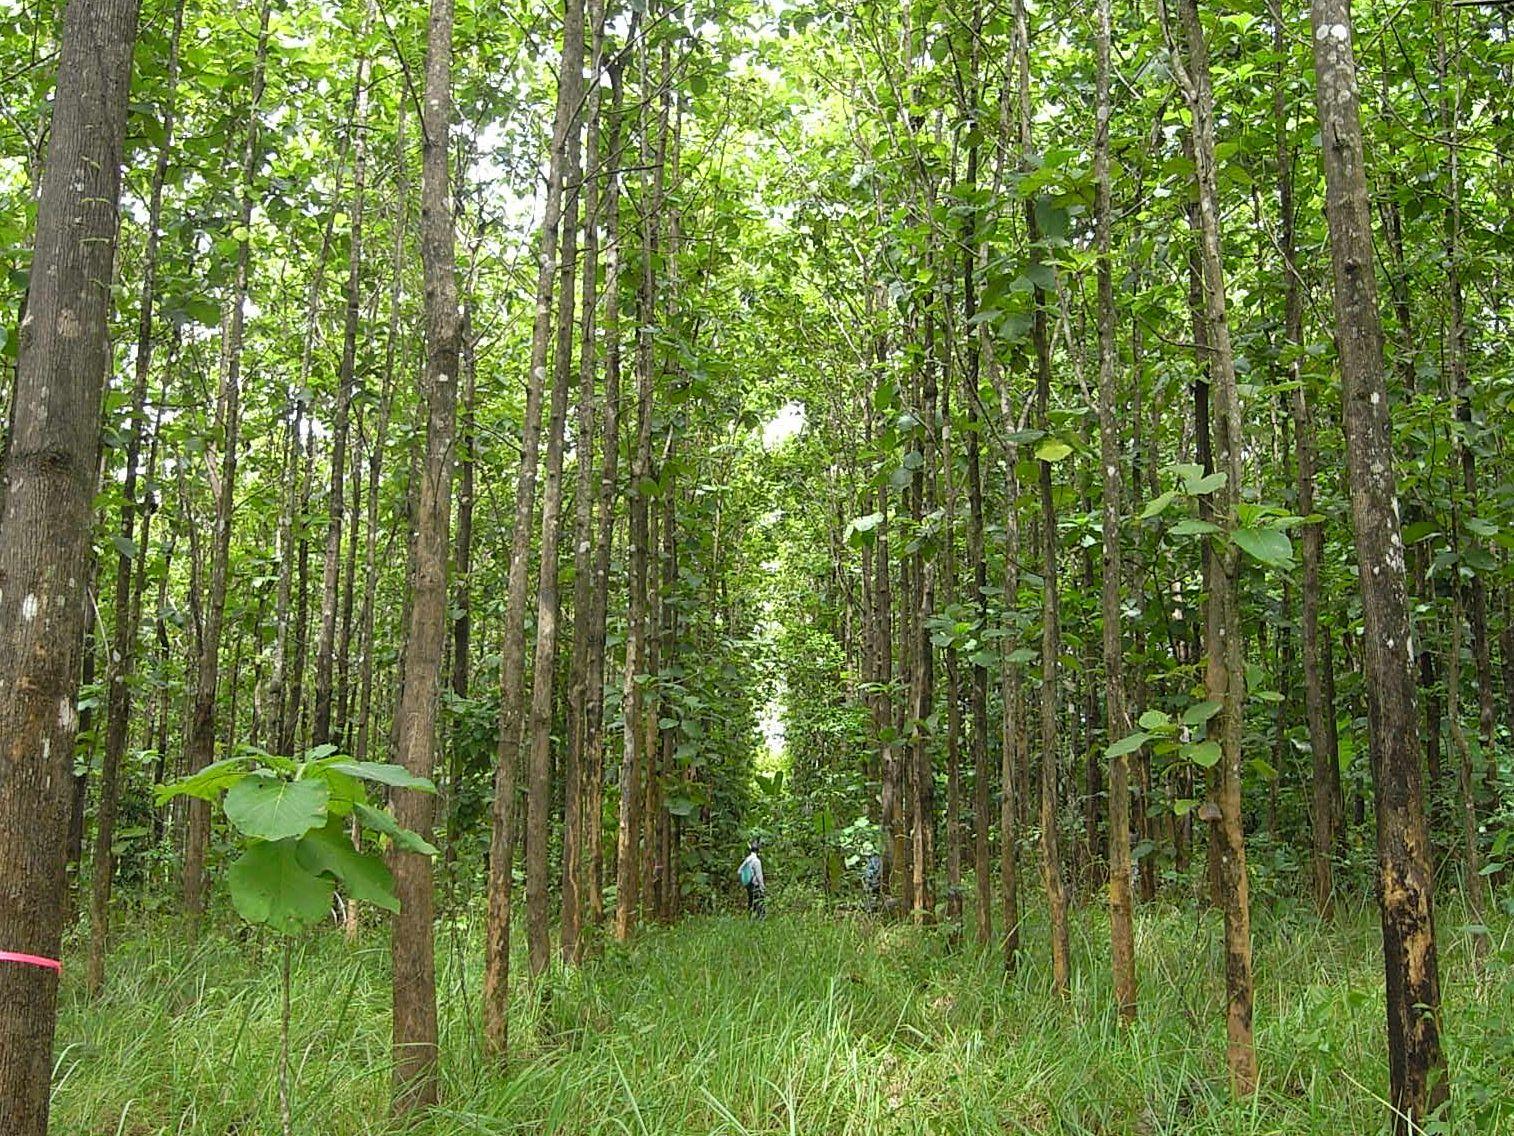 Fig. 2. A teak (Tectona grandis) plantation, 15 years old, Thailand